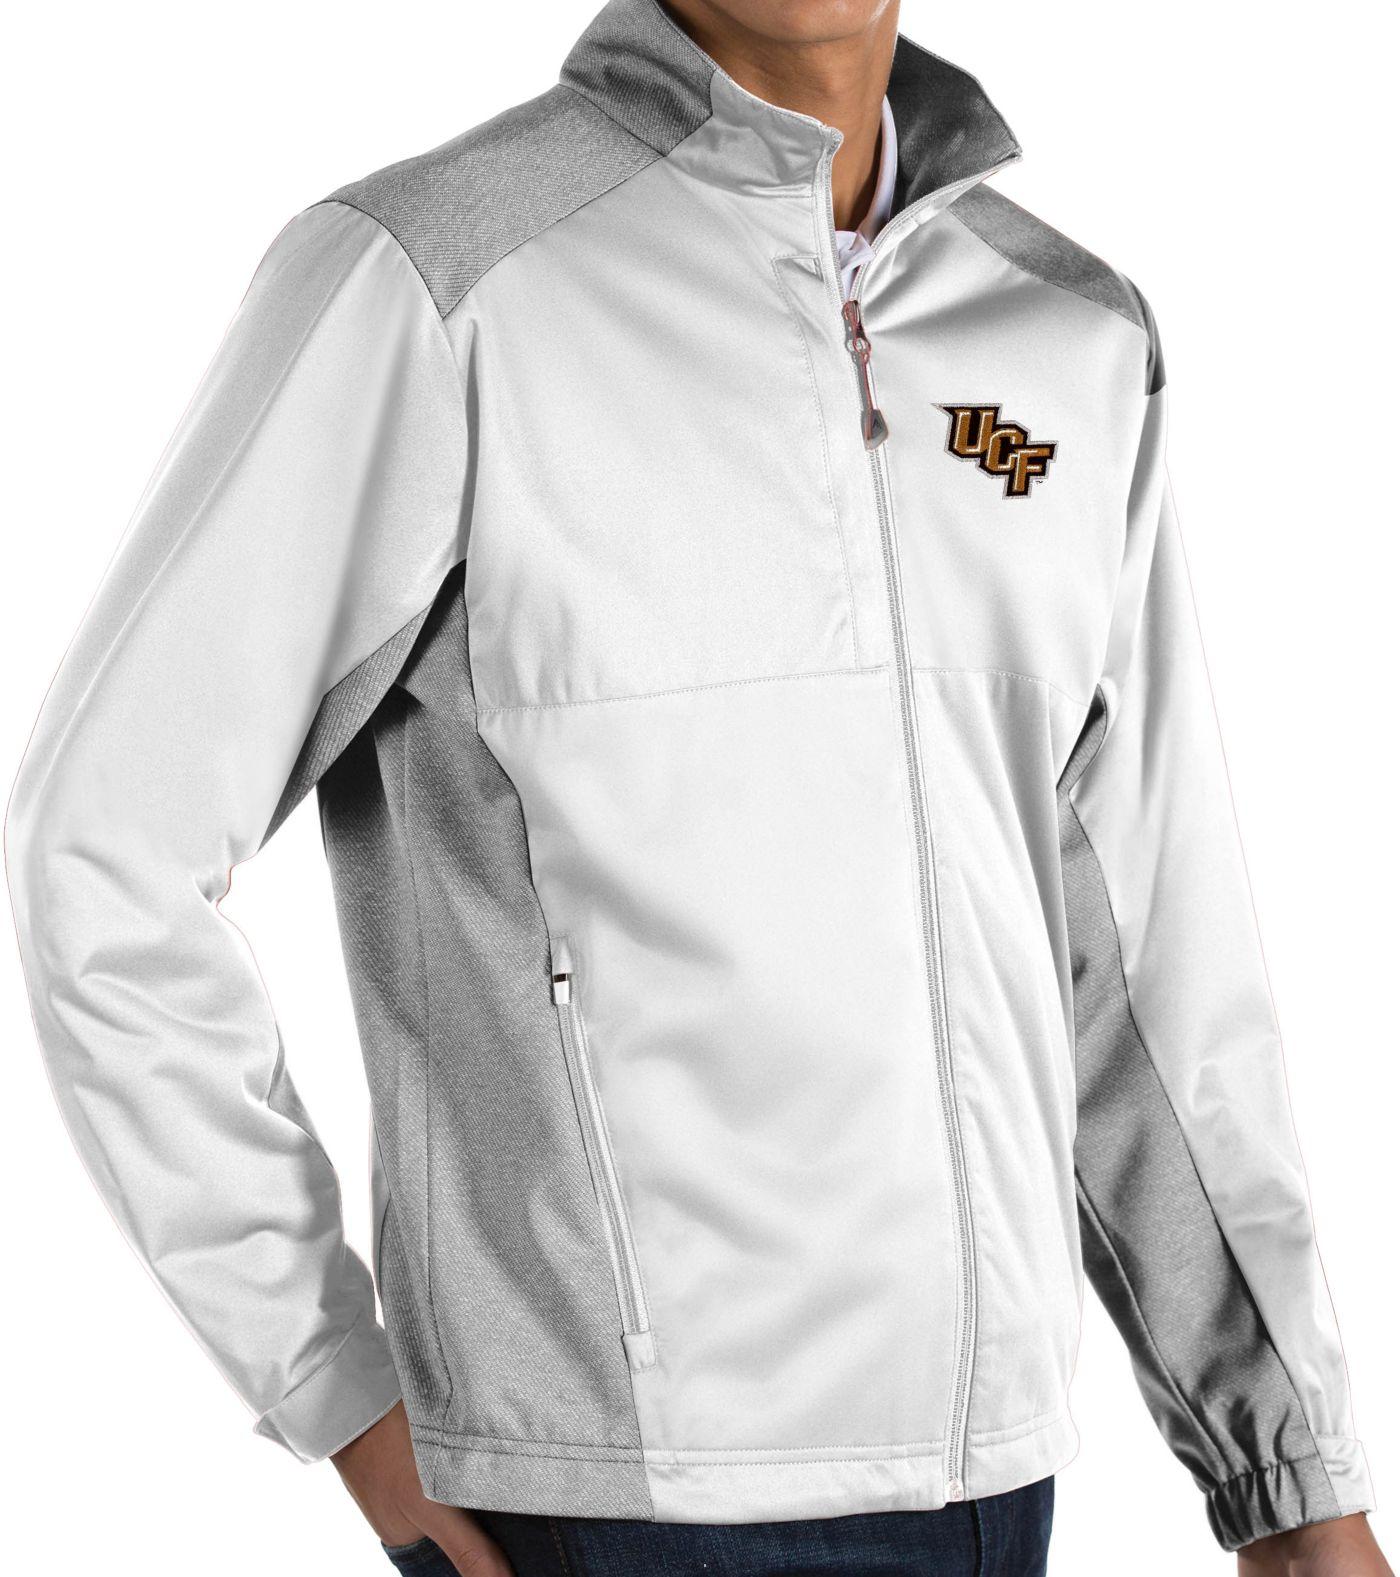 Antigua Men's UCF Knights White Revolve Full-Zip Jacket